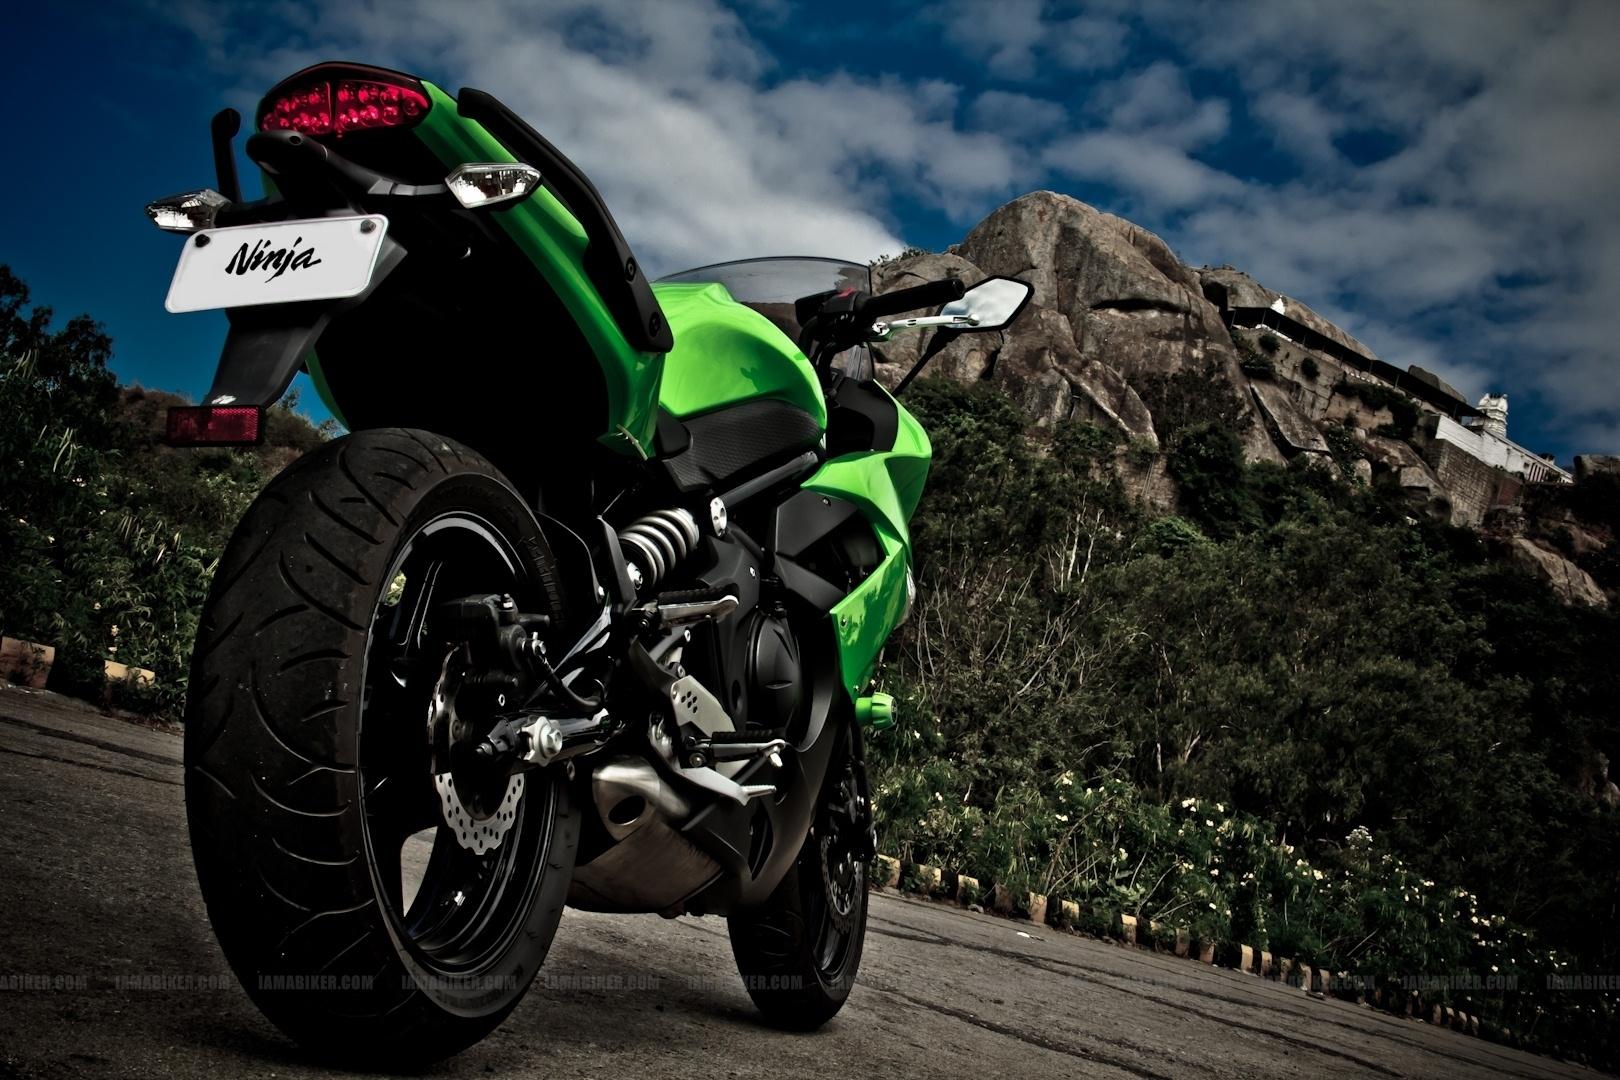 Motos Pisteras Ninja Hd 1280x1024: Kawasaki Ninja Wallpaper HD